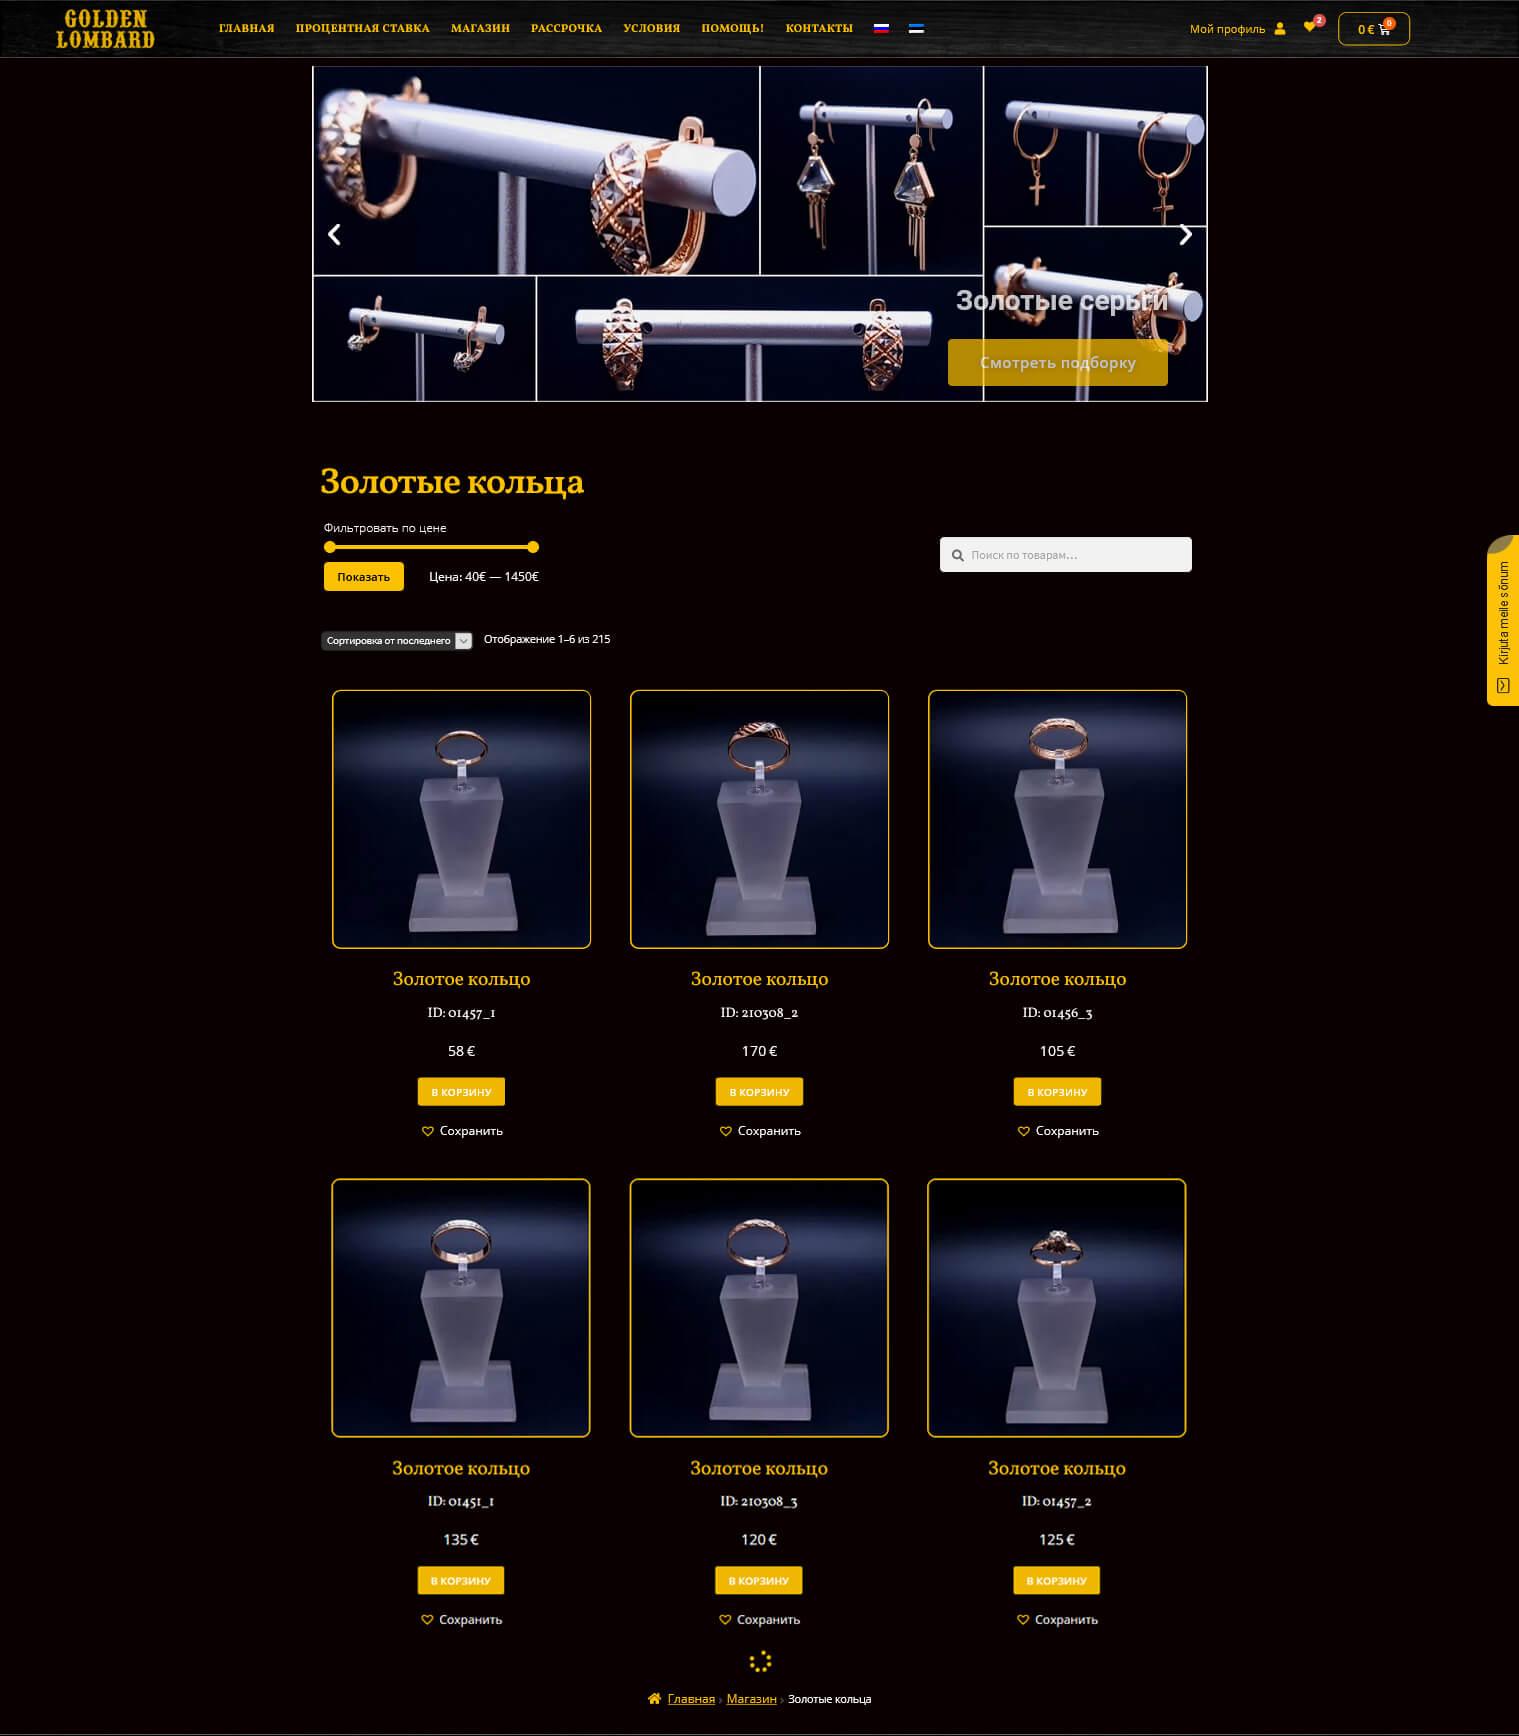 Golden Lombard - страница категории каталога